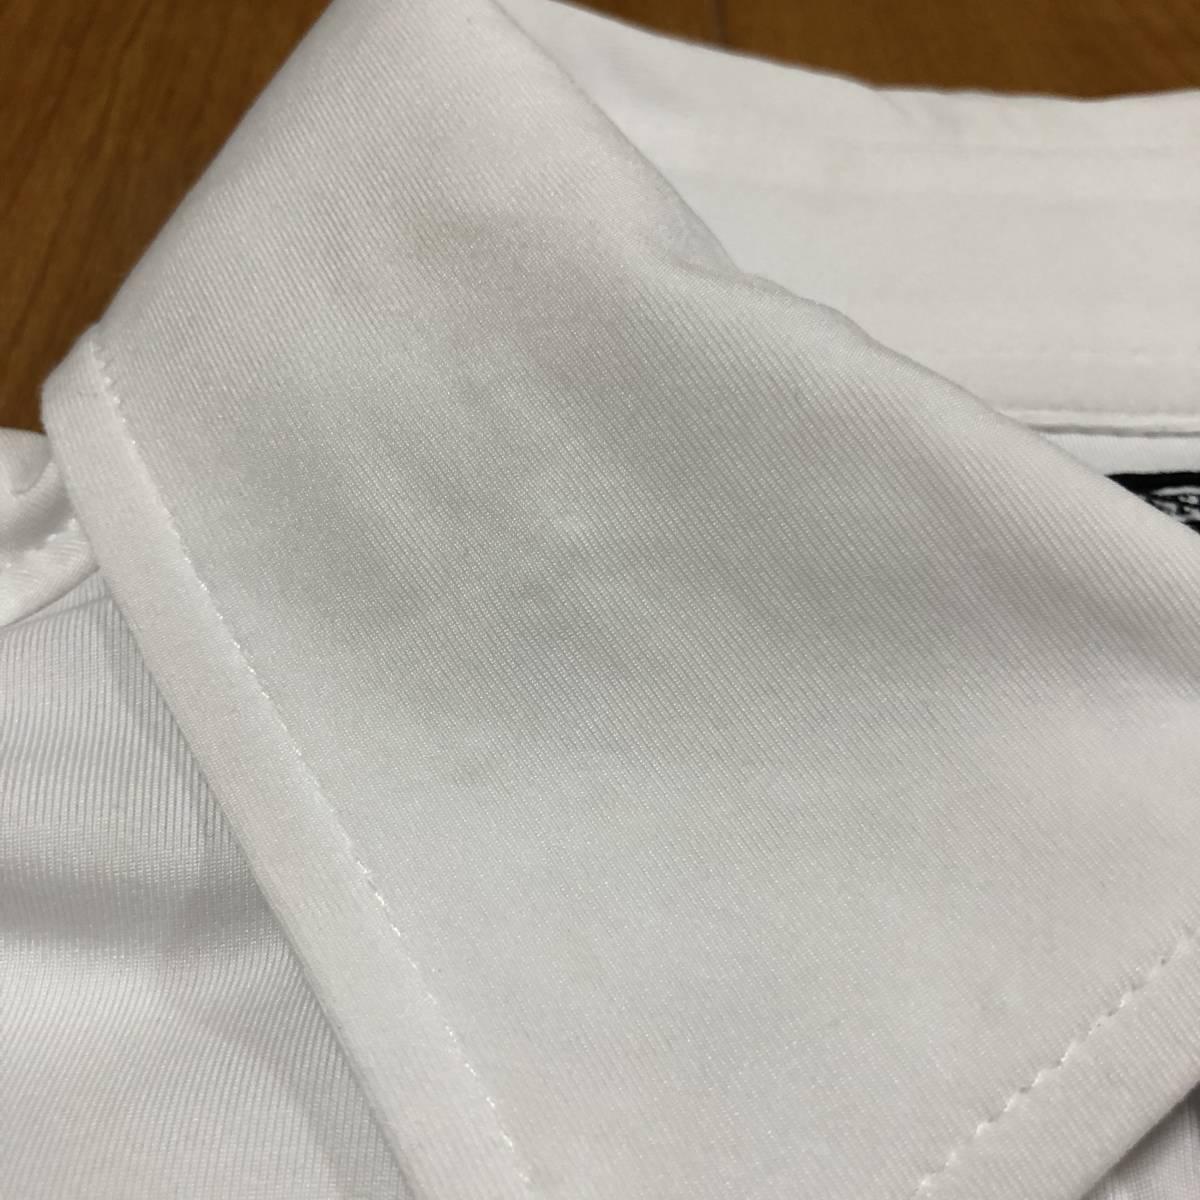 【FOOT JOY】 FJ フットジョイ ゴルフ ウェア 半袖 ポロシャツ メンズ 男性用_画像6